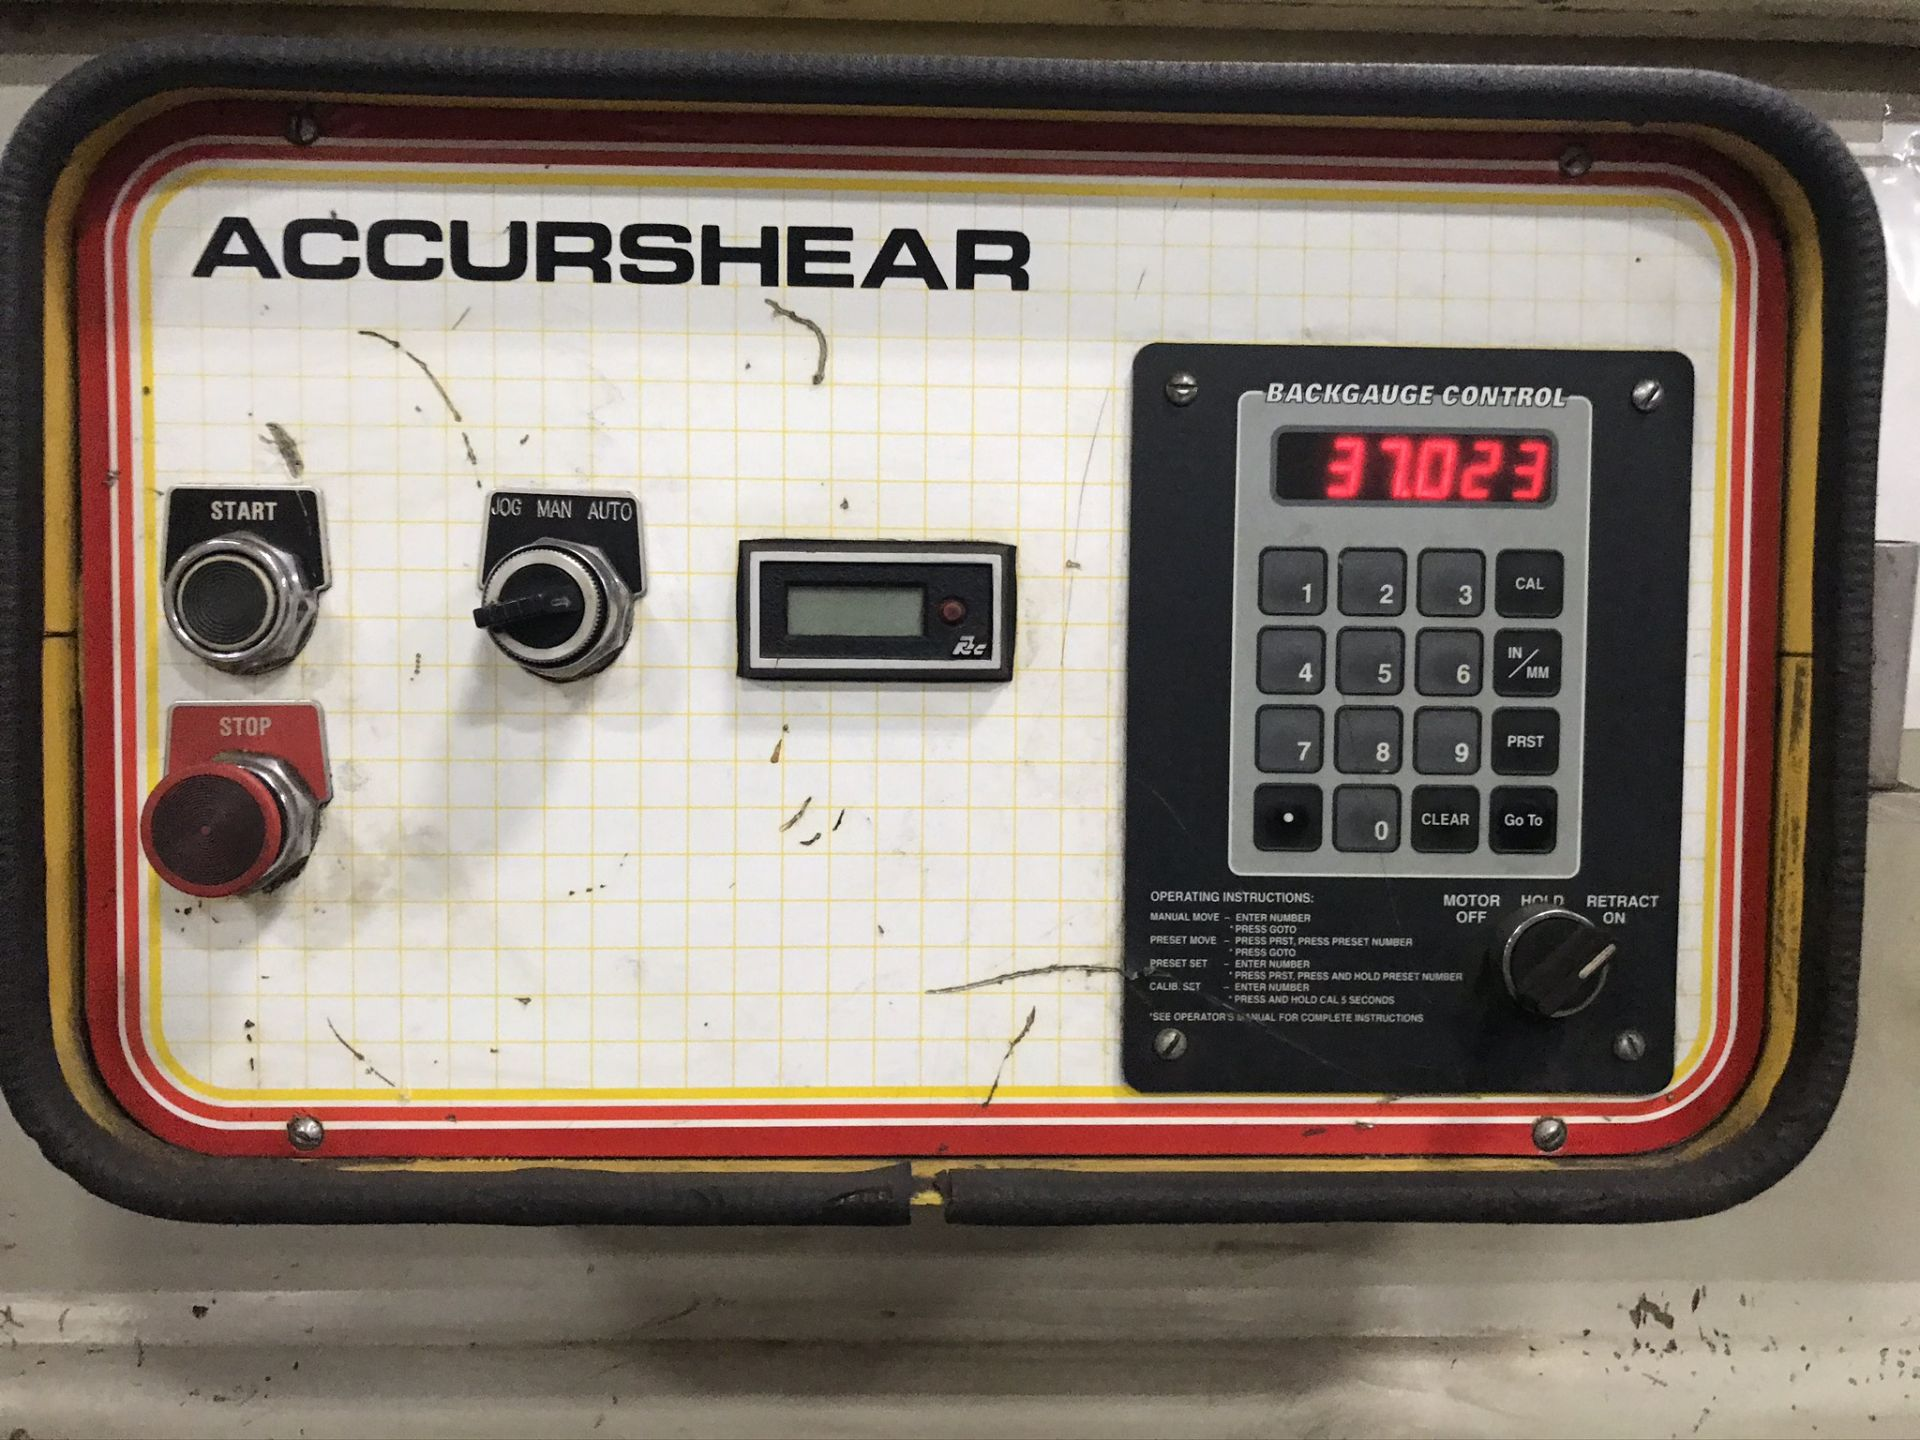 "Accurshear 625010, 1/4"" x10' Hydraulic Shear, 36"" Programmable Backgauge - Image 5 of 6"